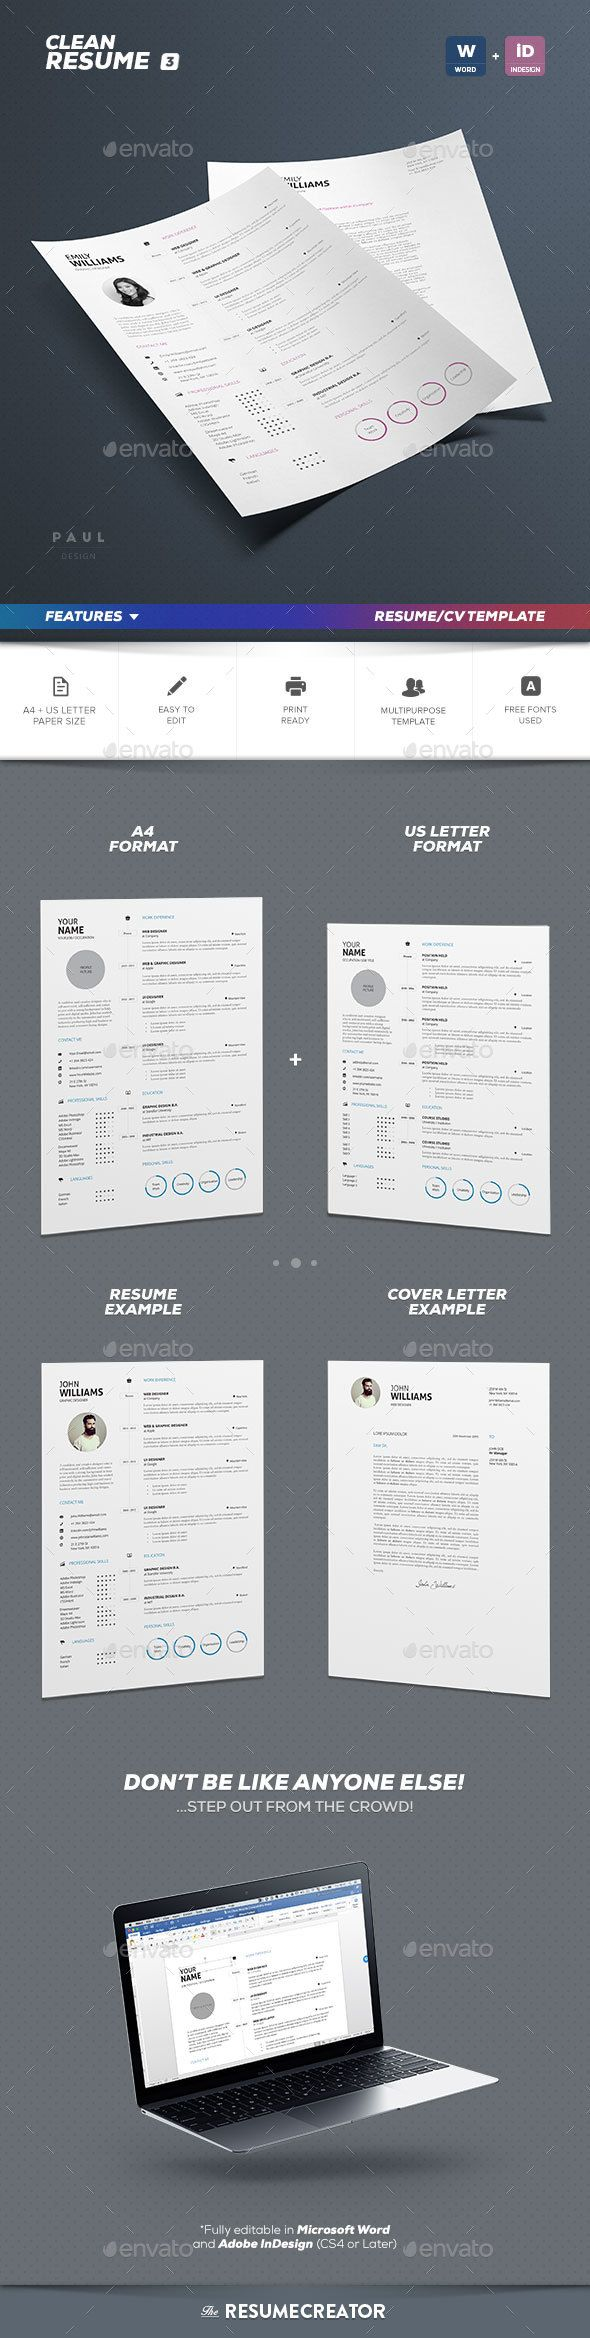 216 best resume templates images on pinterest